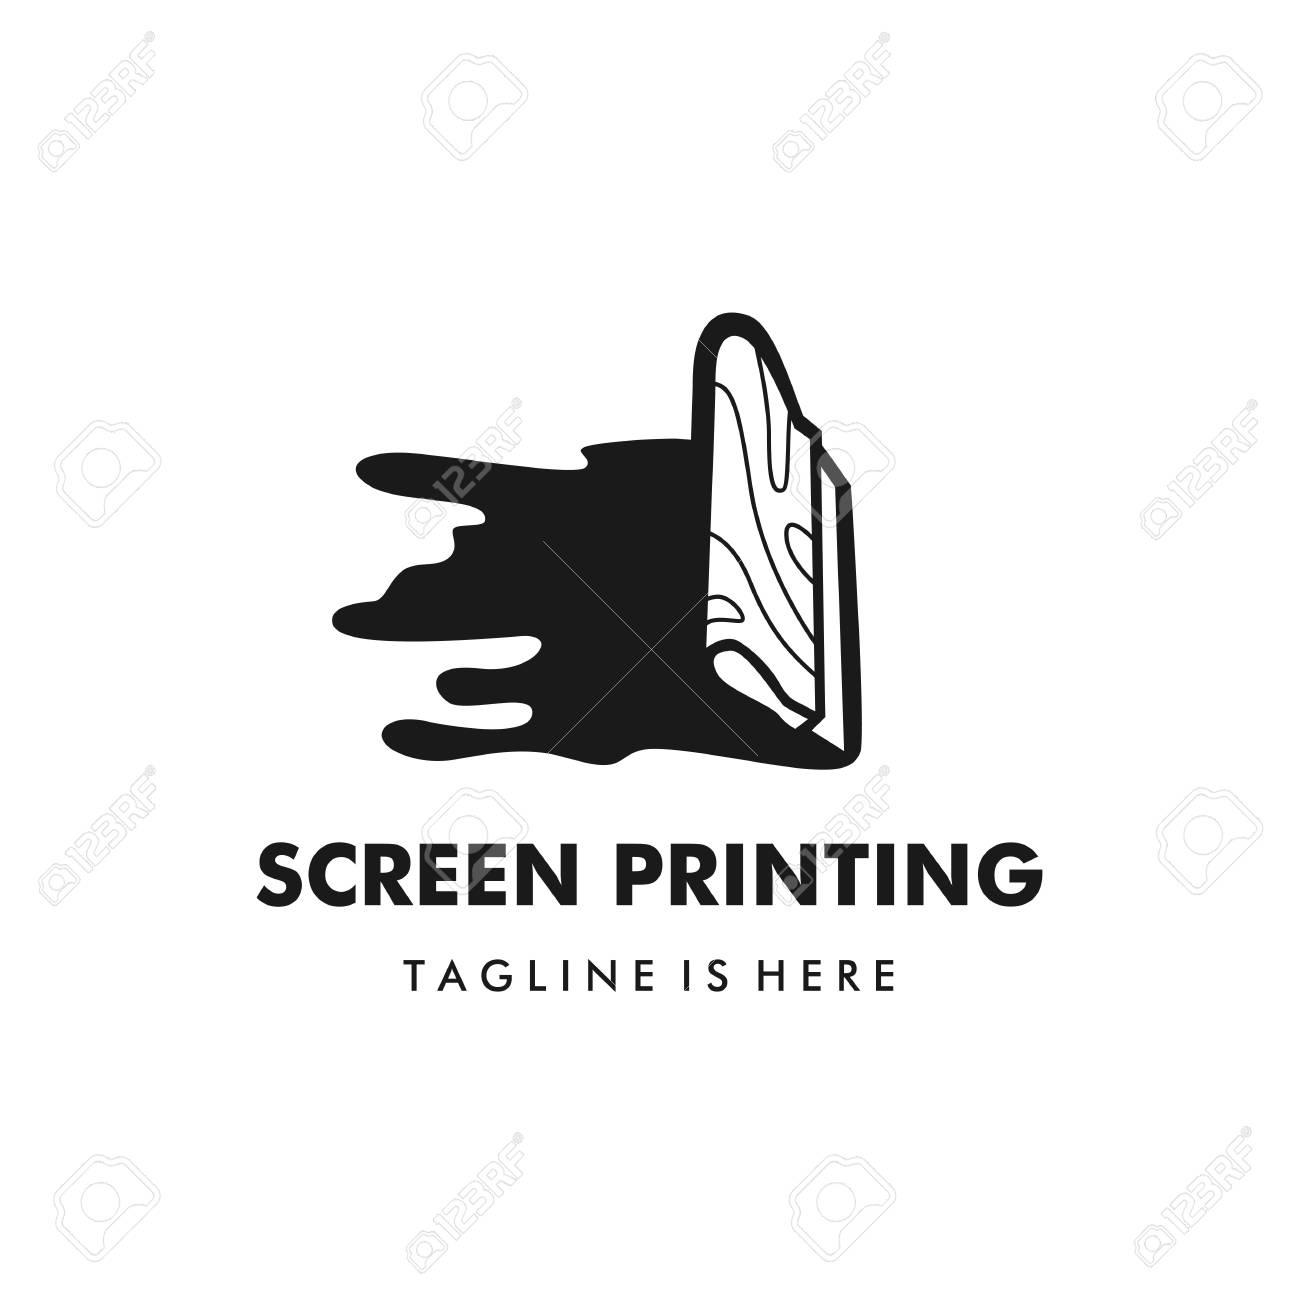 screen printing silk screenprinting logo vector illustration - 107800723